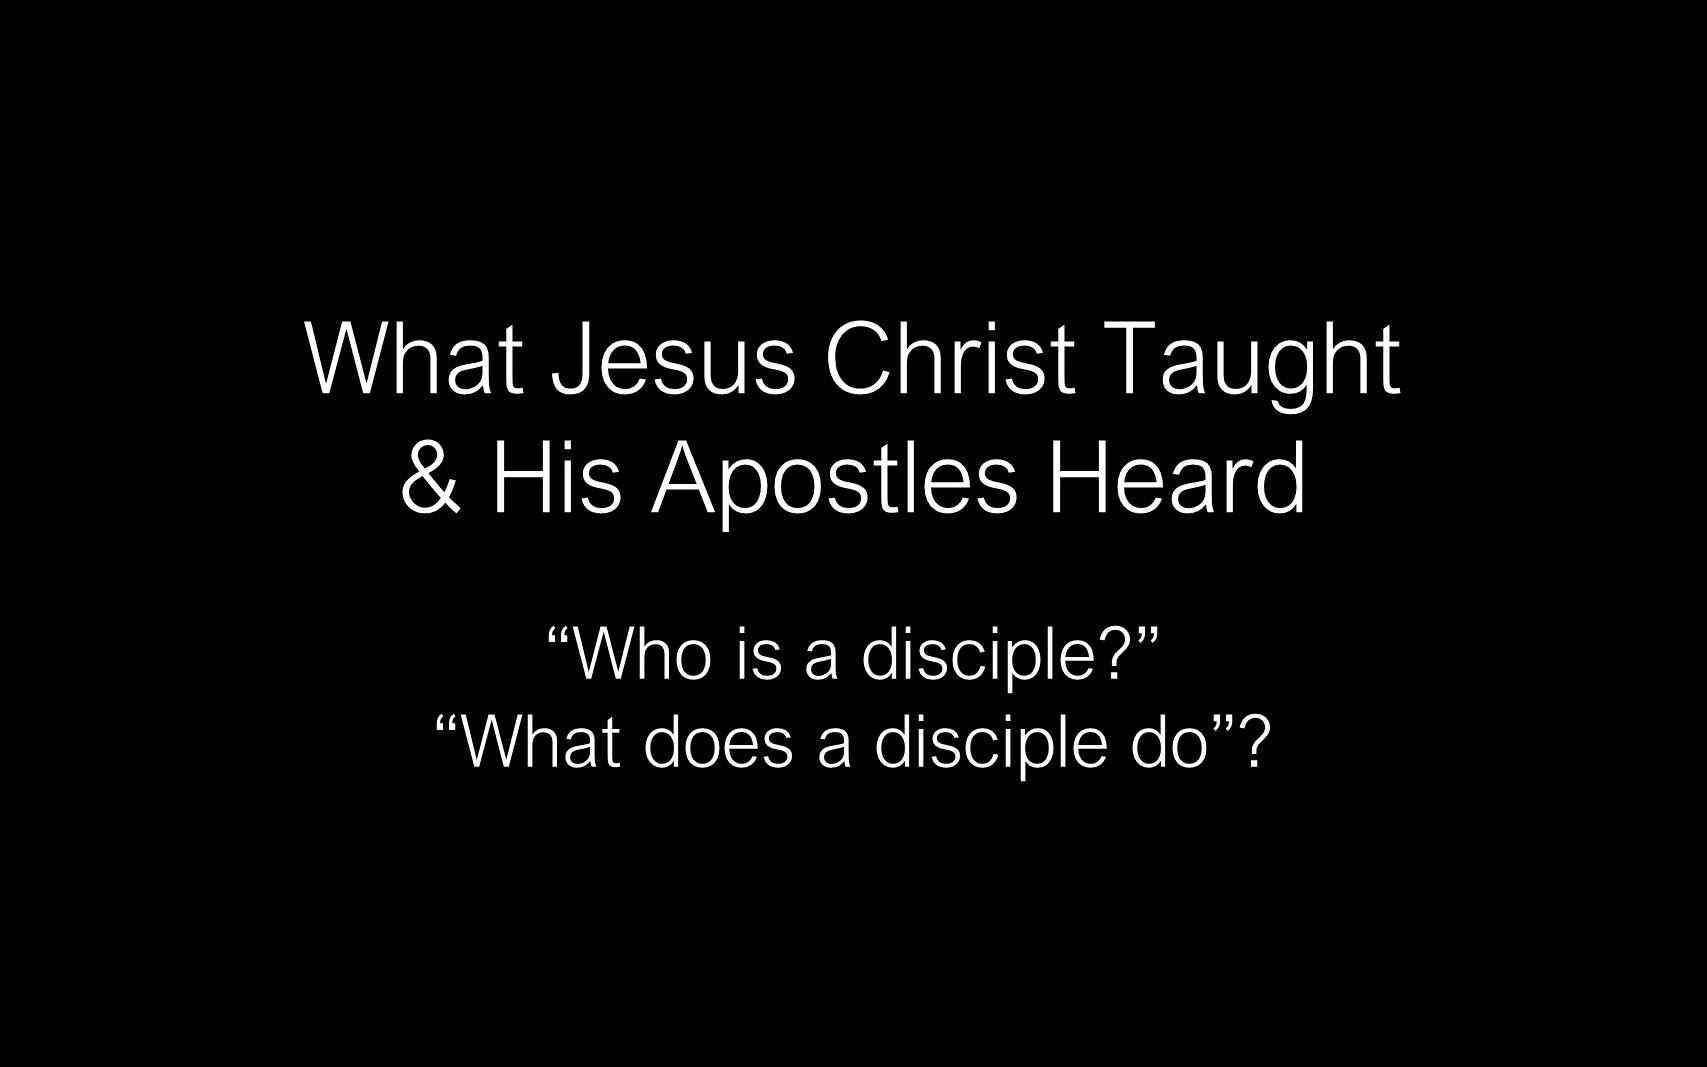 ESH-11 - The Discipline Of Disciple-Making - Disciples - Follow Christ & Make Disciples (8)